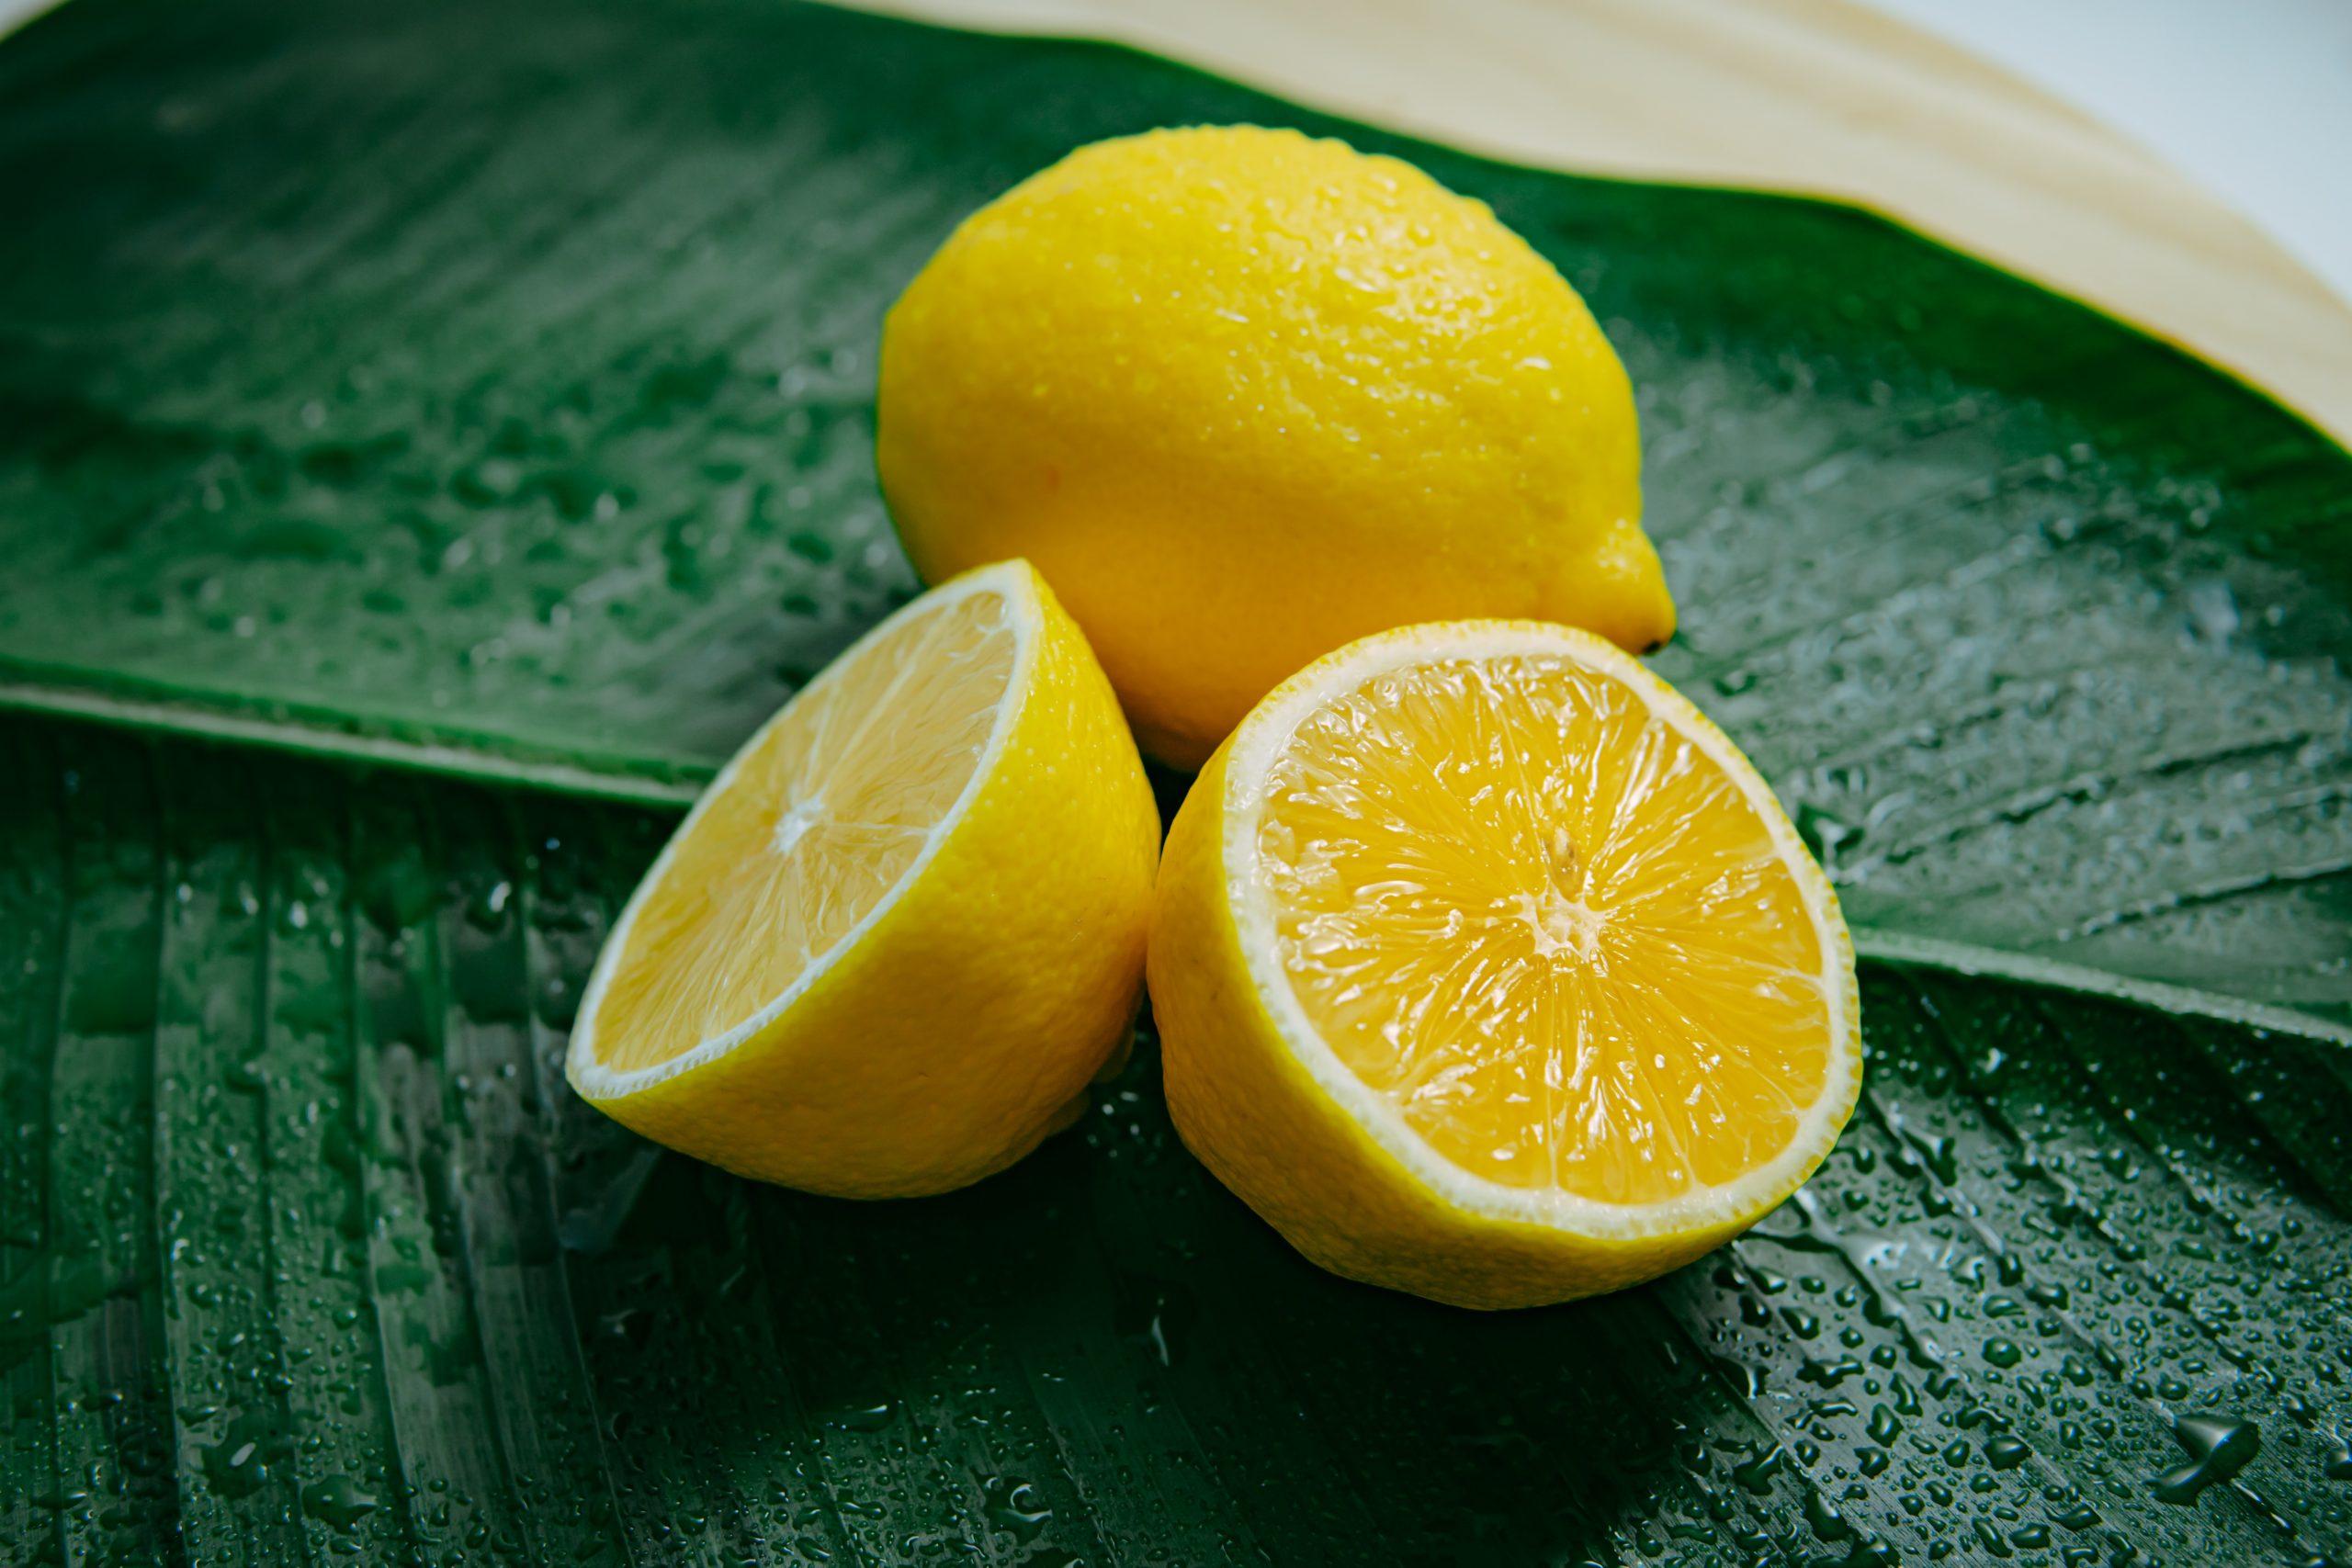 Capsule huile essentielle – Le citron